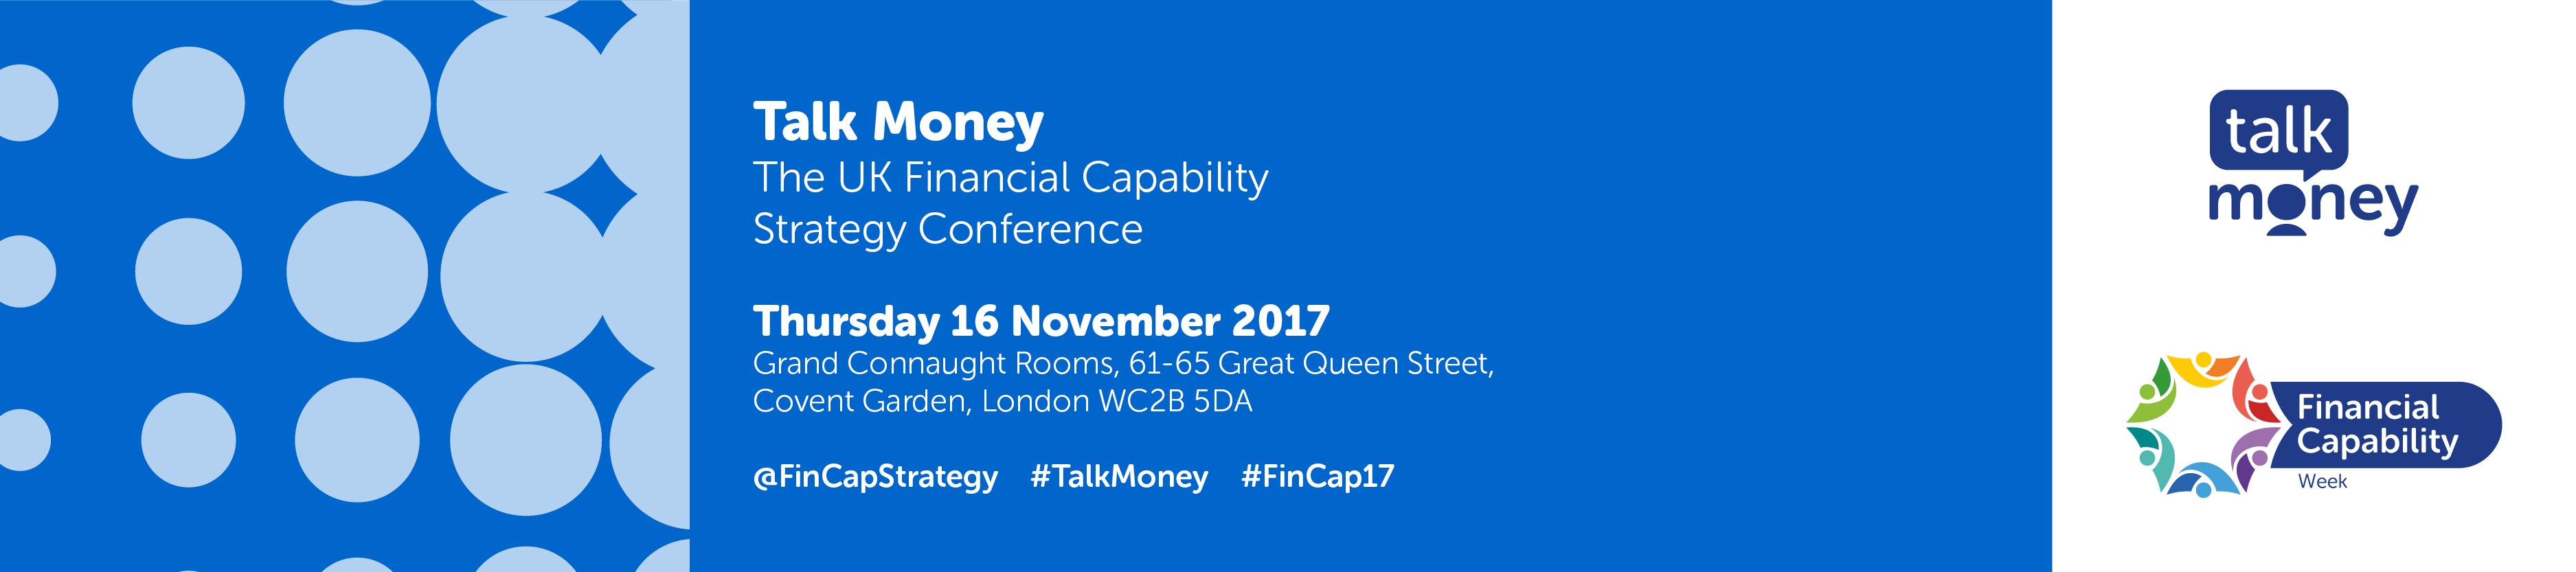 Talk Money - UK Financial Capability Strategy Conference